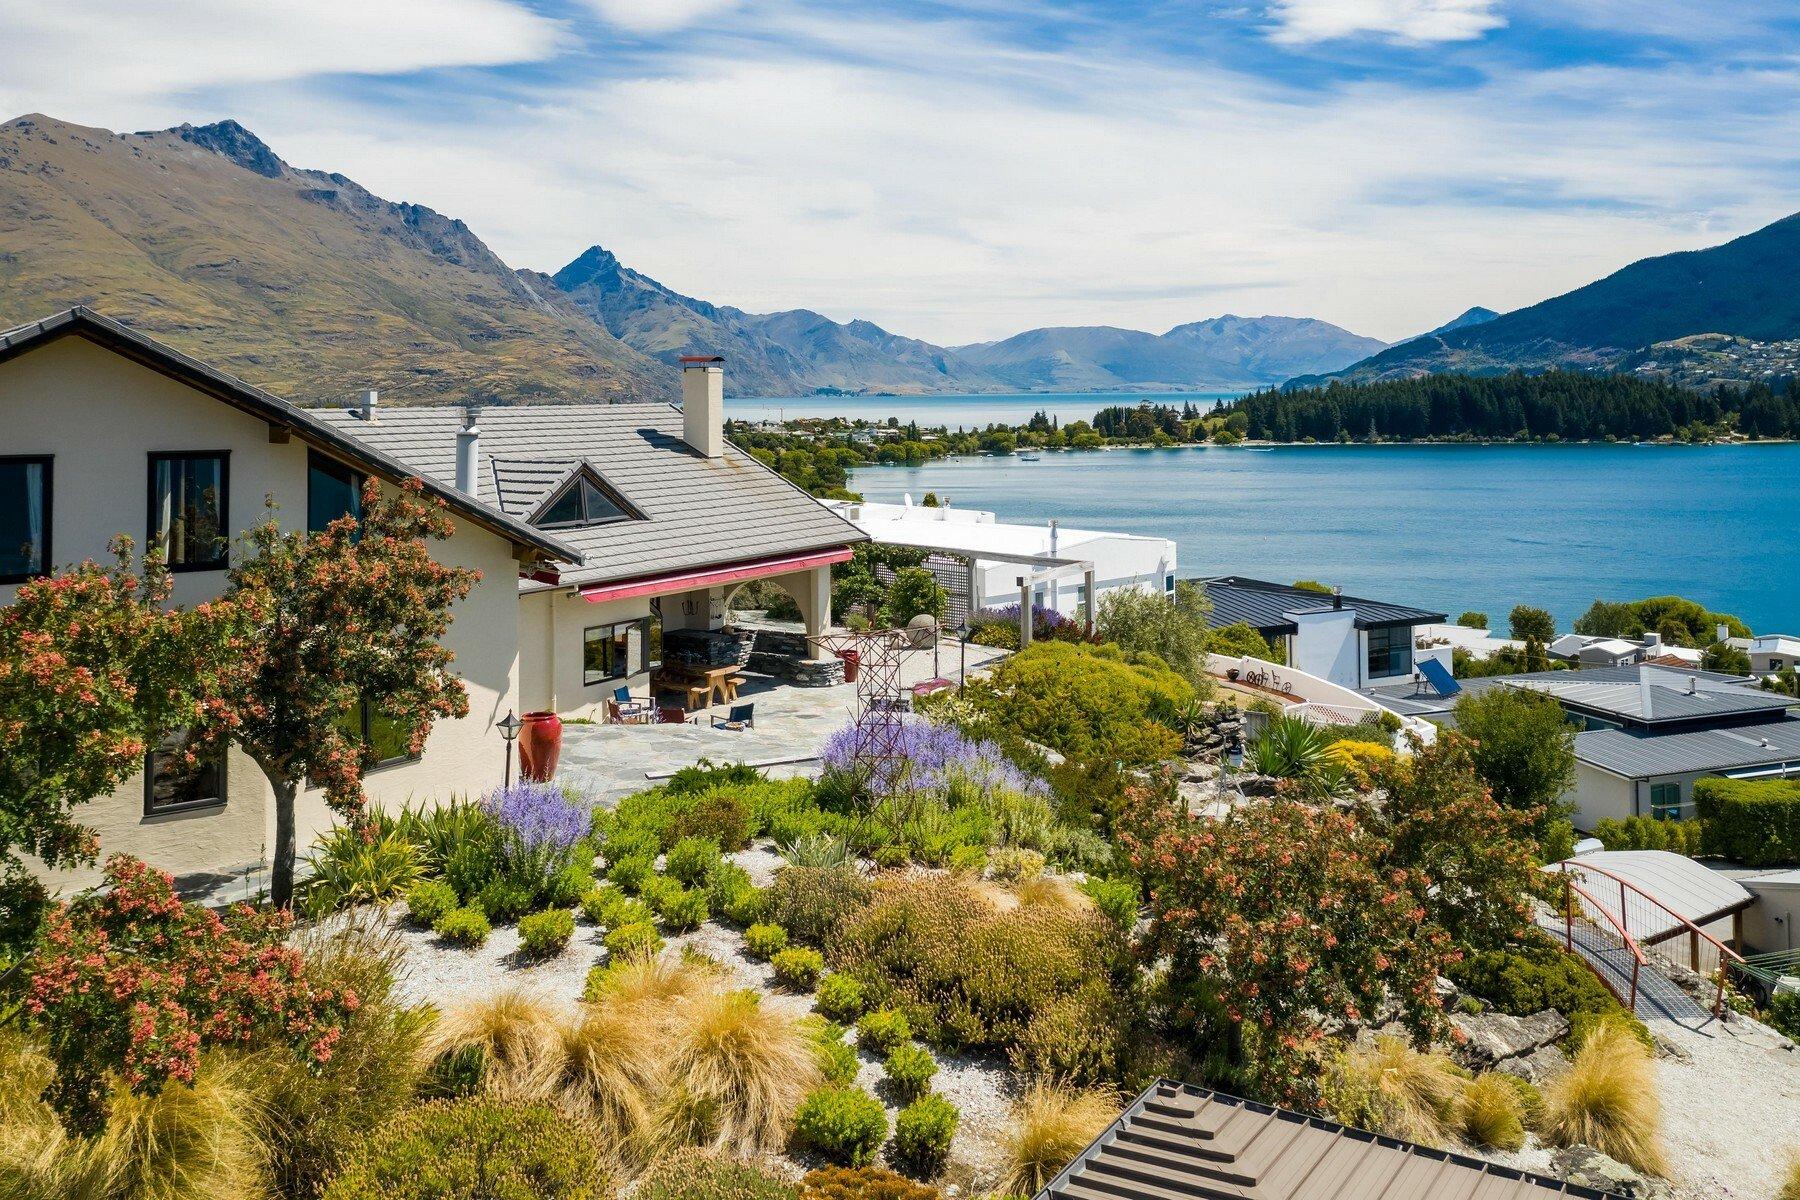 House in Kelvin Heights, Otago, New Zealand 1